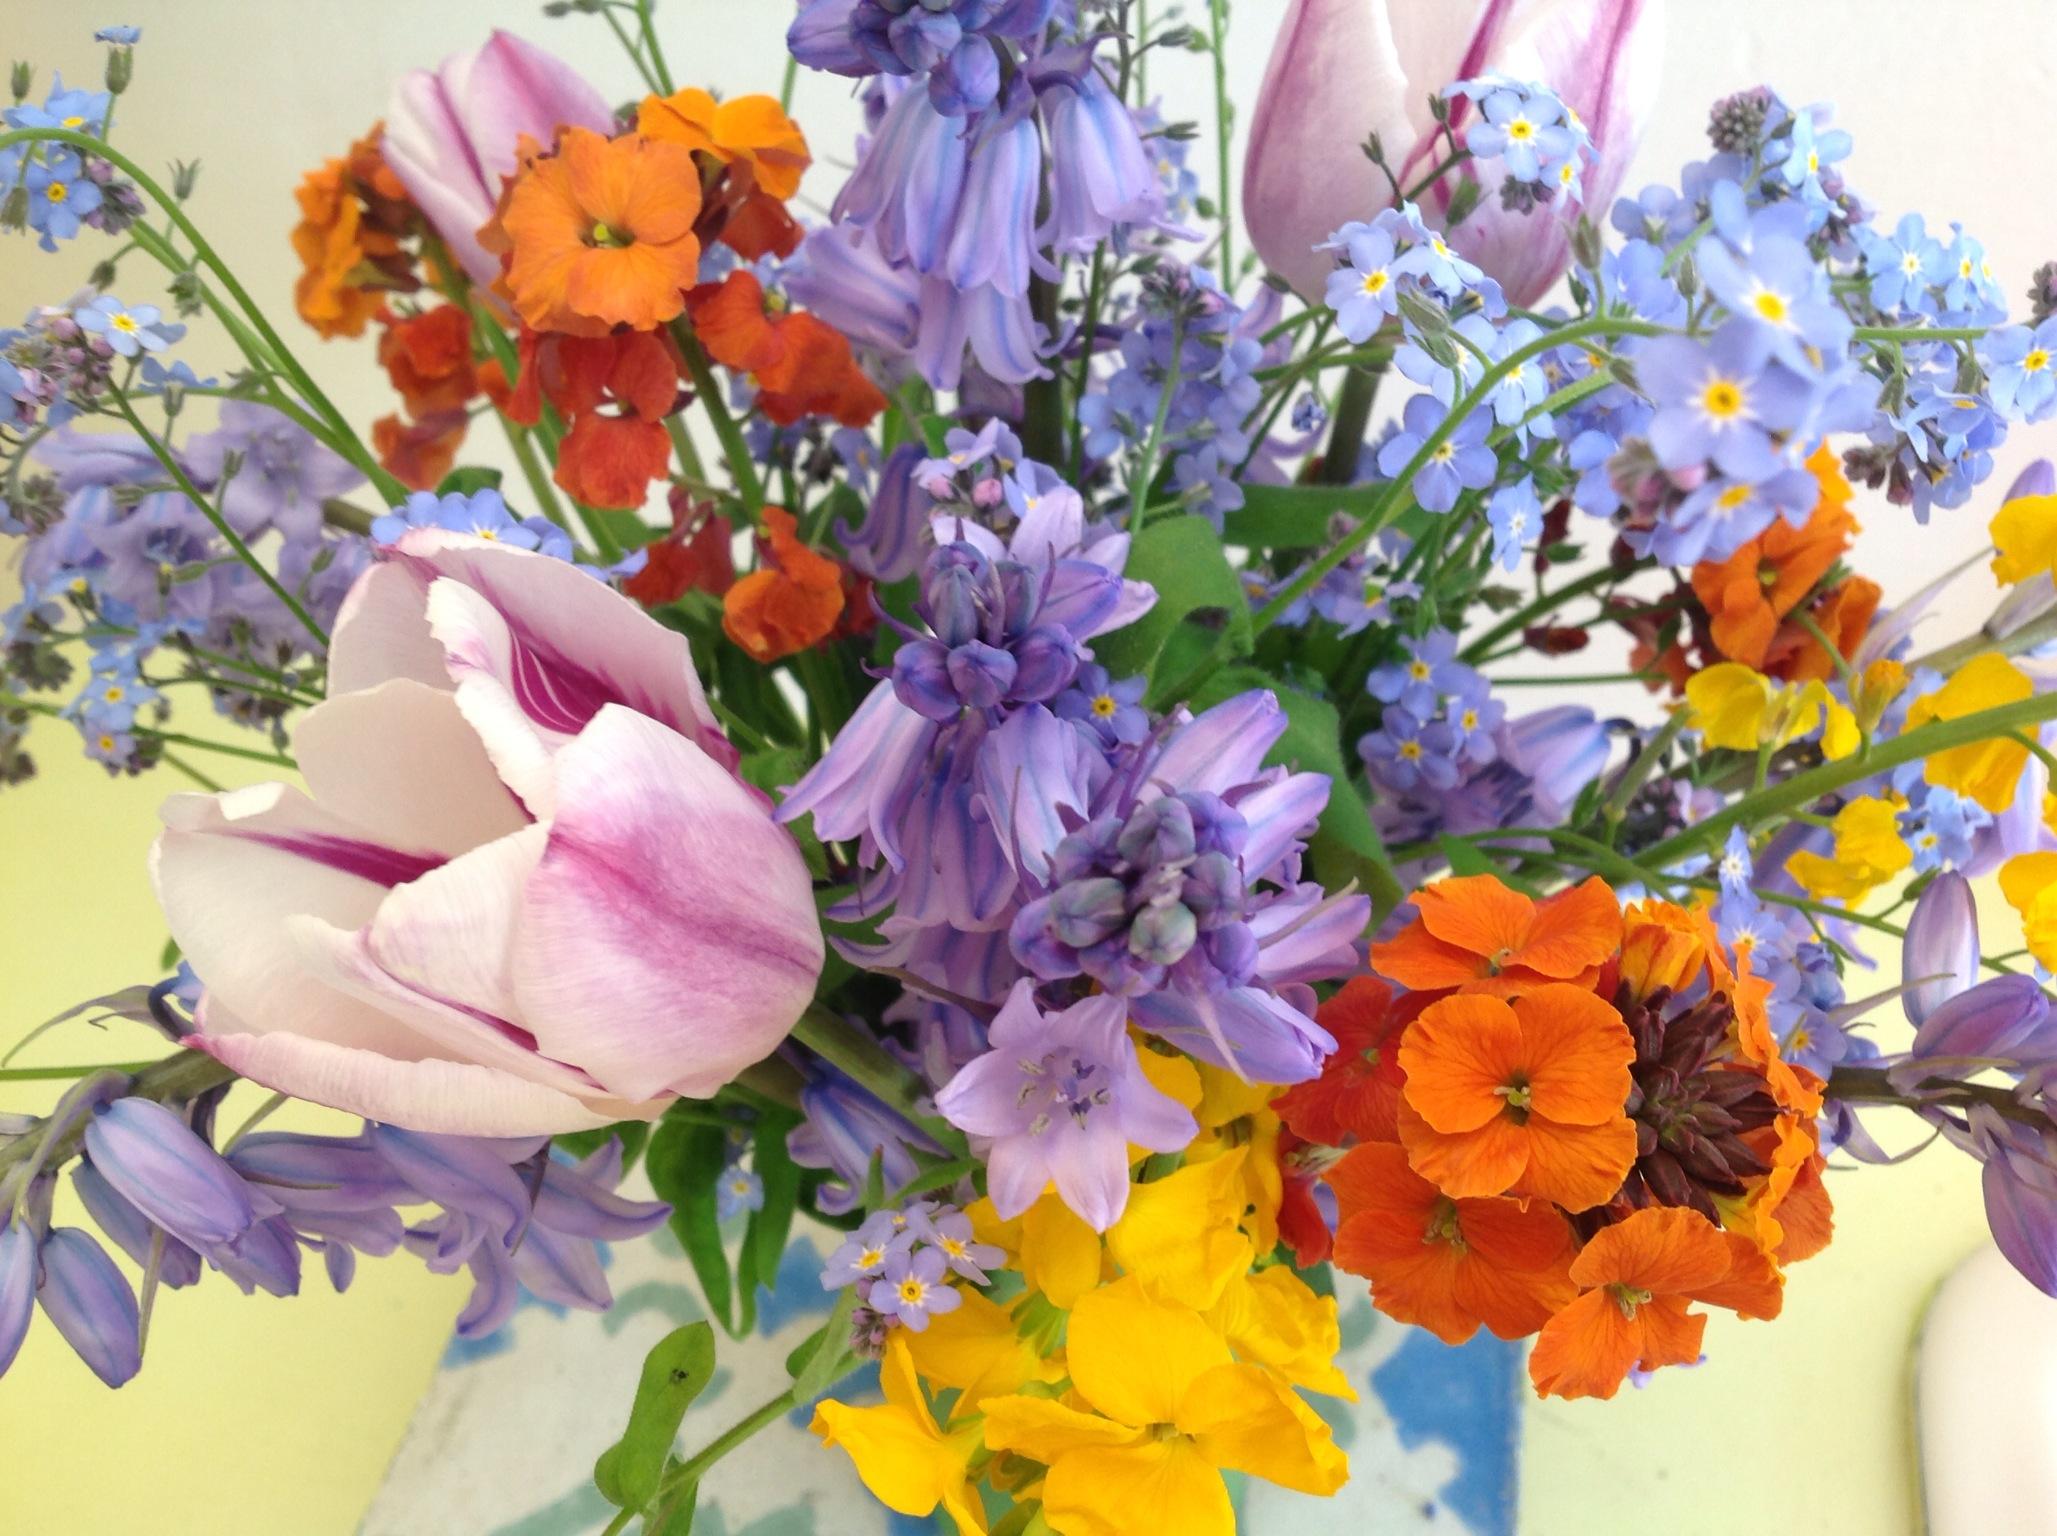 Wall flowers